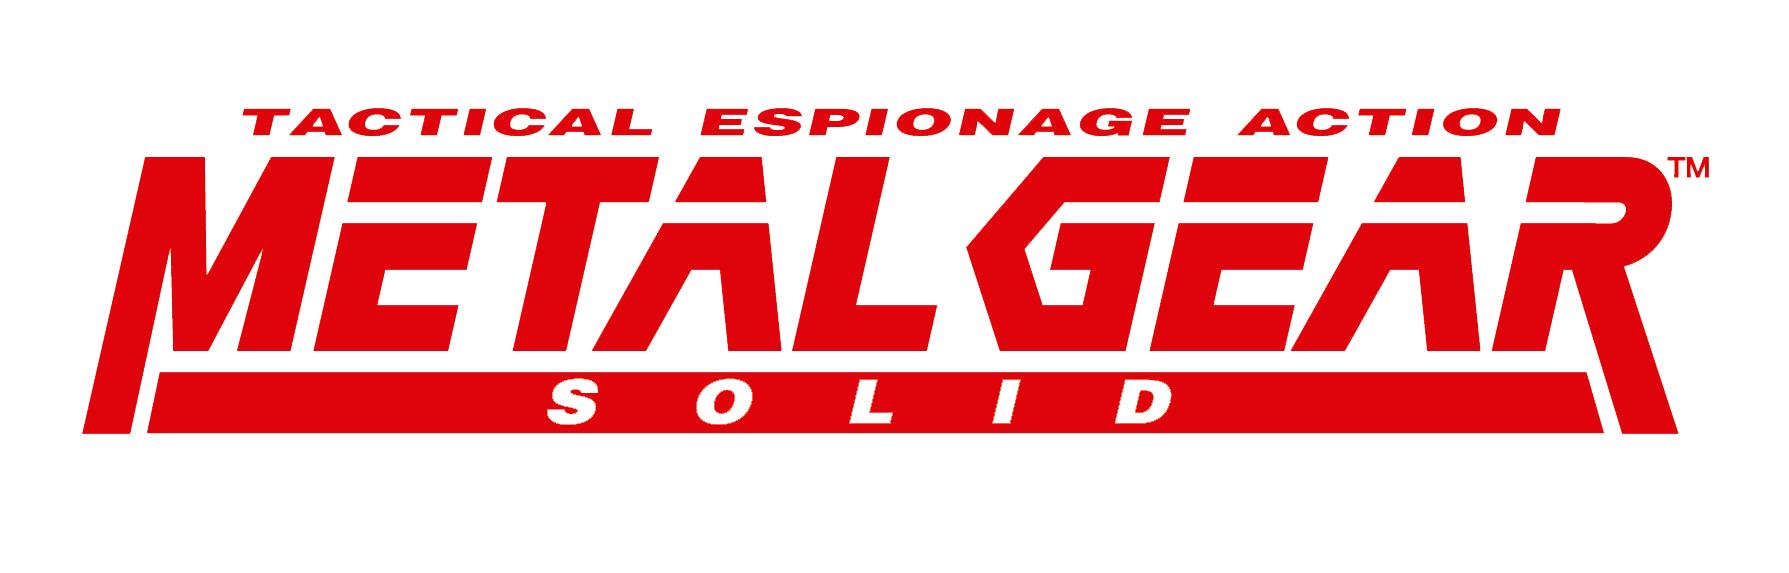 Metal Gear Solid Metal Gear Solid Metal Gear Metal Gear Solid 6